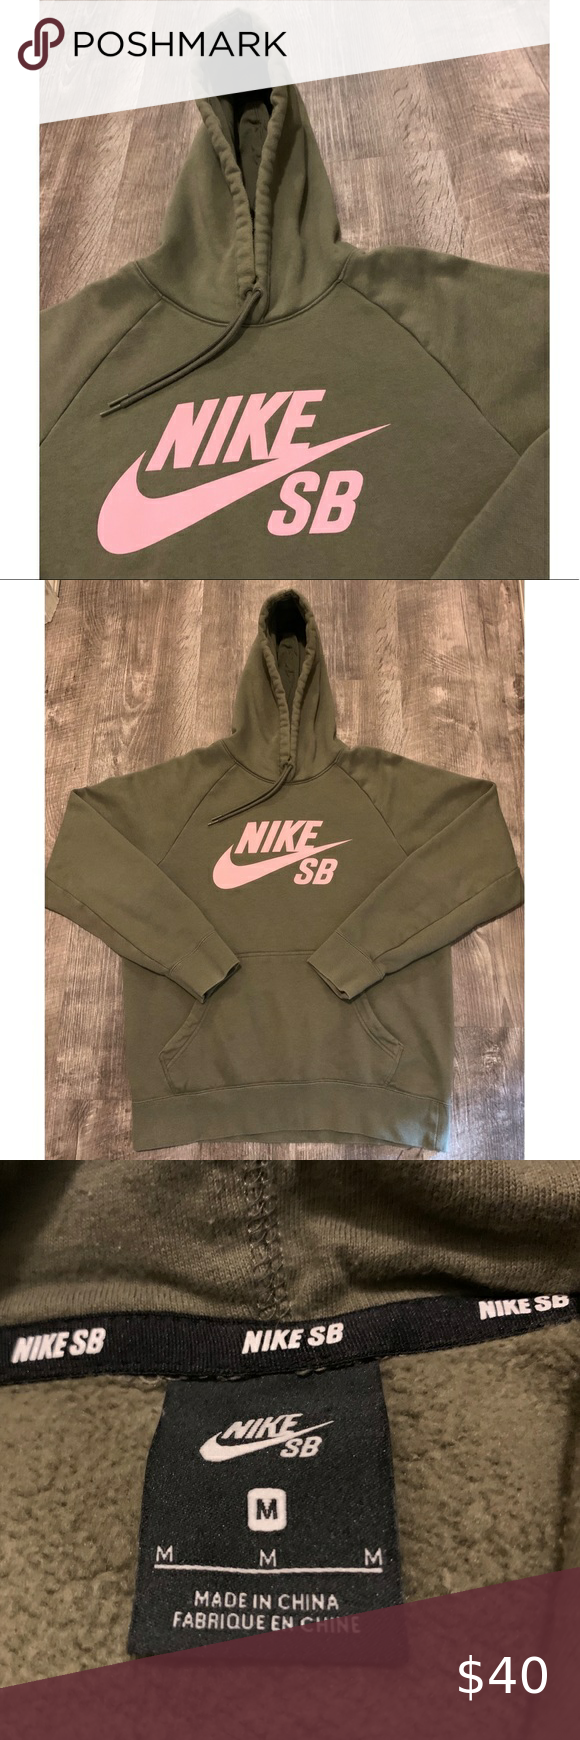 Nike Sb Hoodie Hoodies Nike Sb Sweatshirt Shirt [ 1740 x 580 Pixel ]